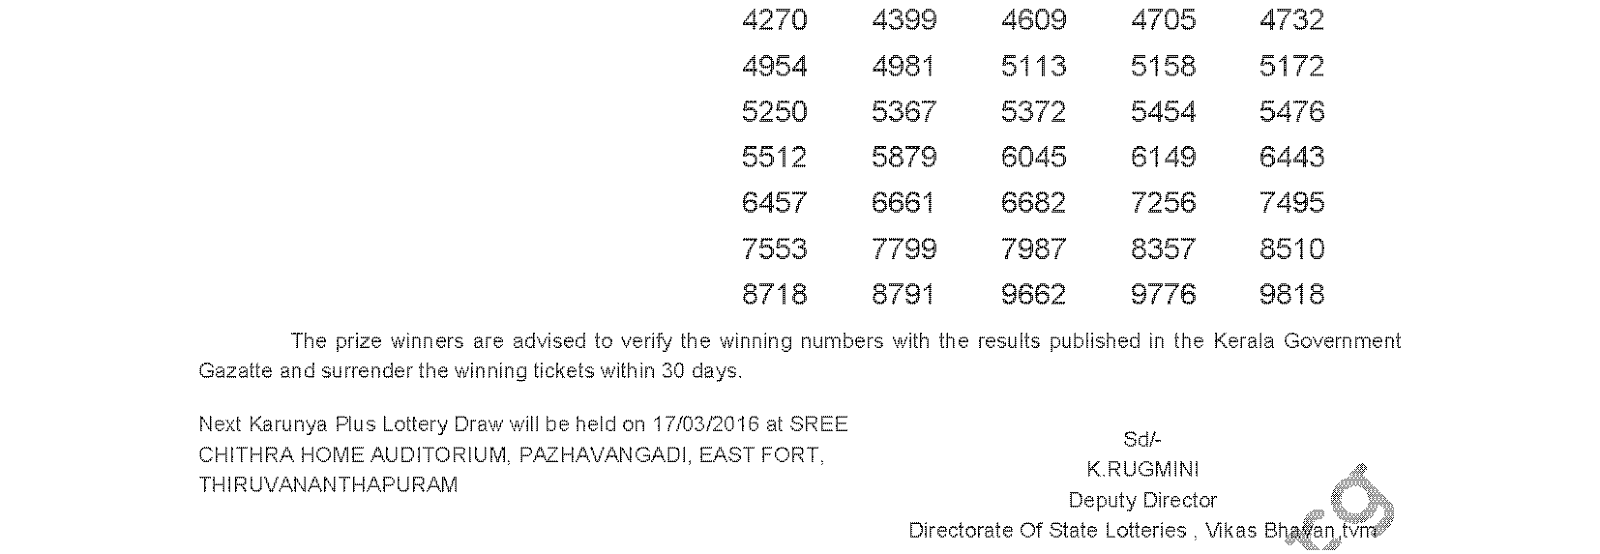 KARUNYA PLUS Lottery KN 100 Result 10-03-2016